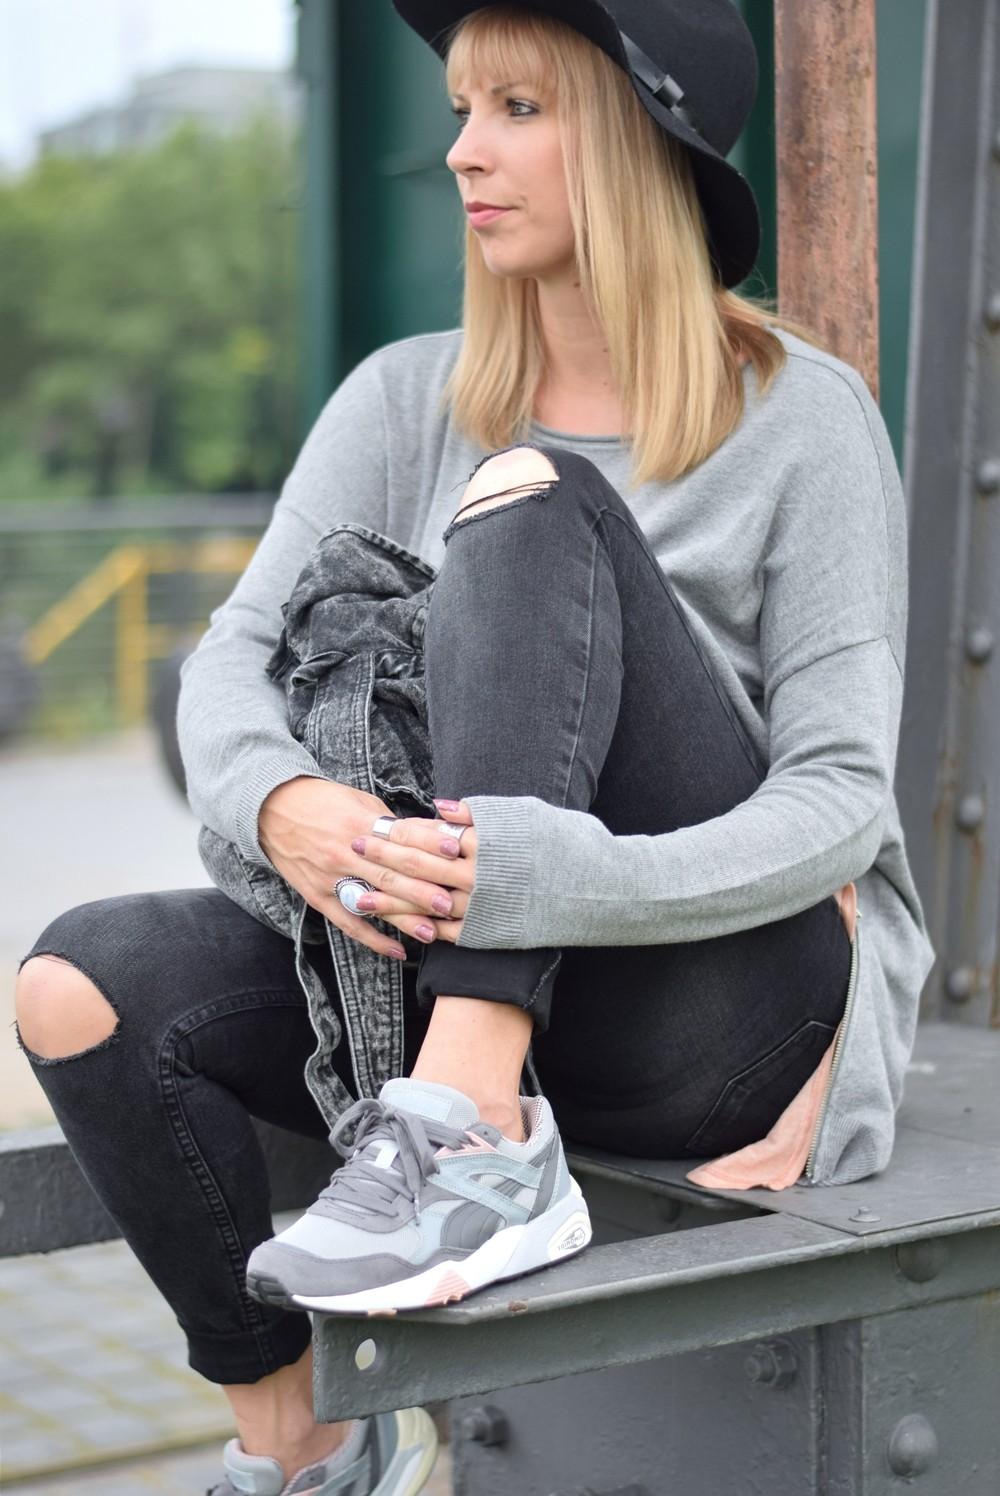 Puma-Vashtie-Outfit-grau-Jeans-Sweater-6